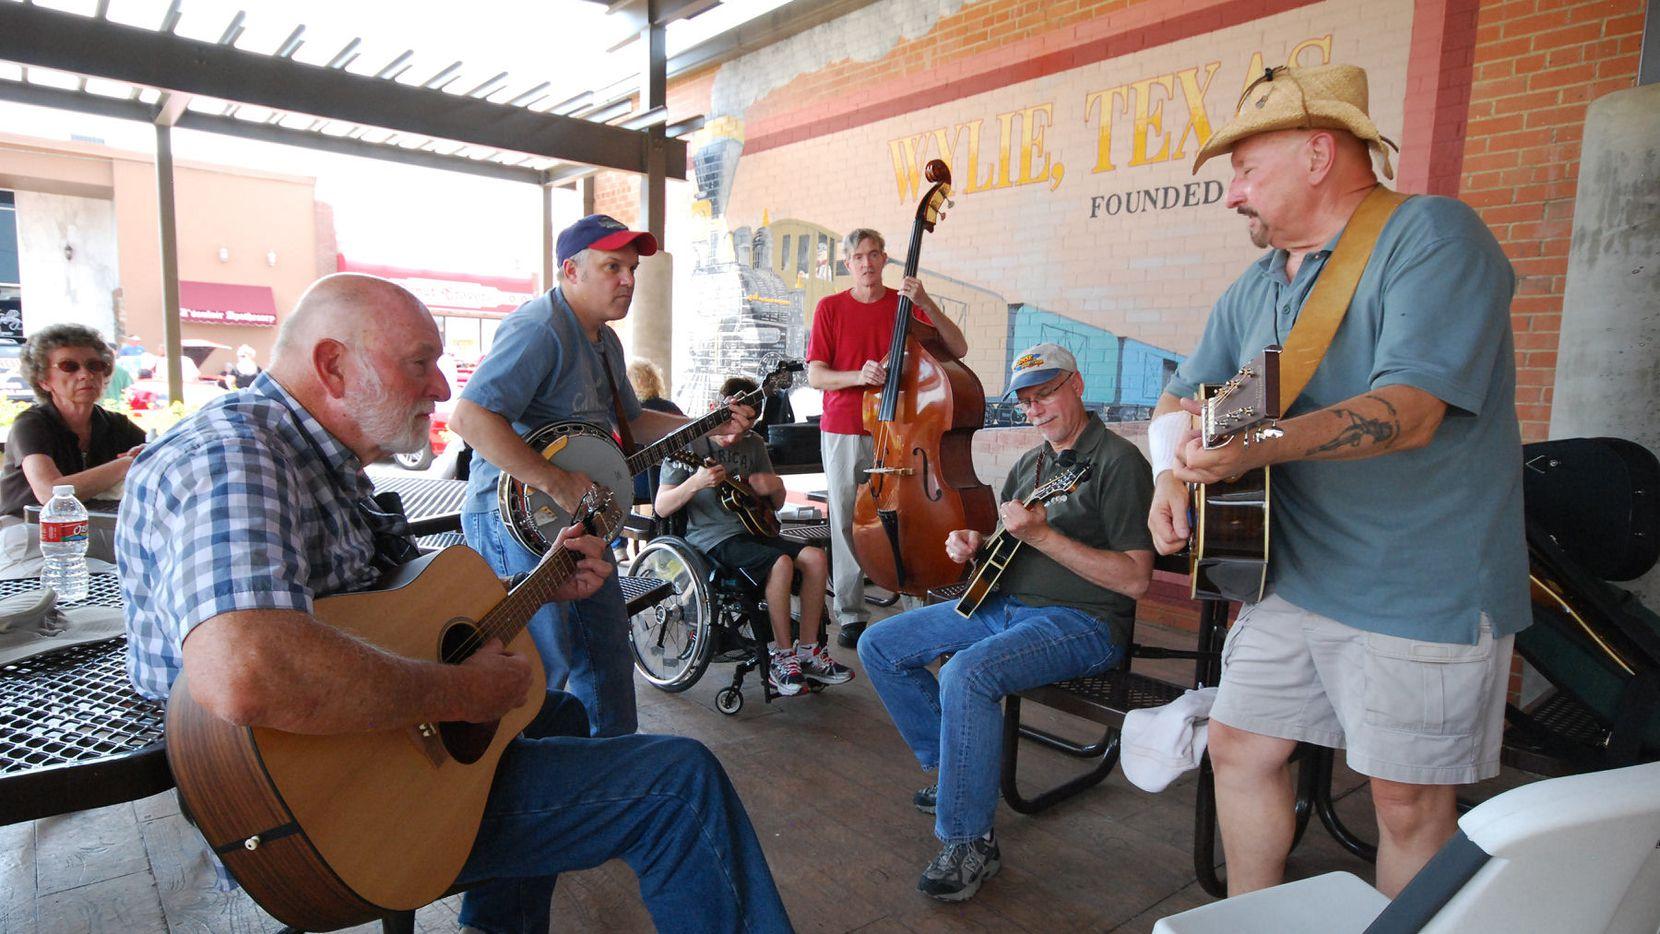 Musicians perform during Bluegrass on Ballard in downtown Wylie.